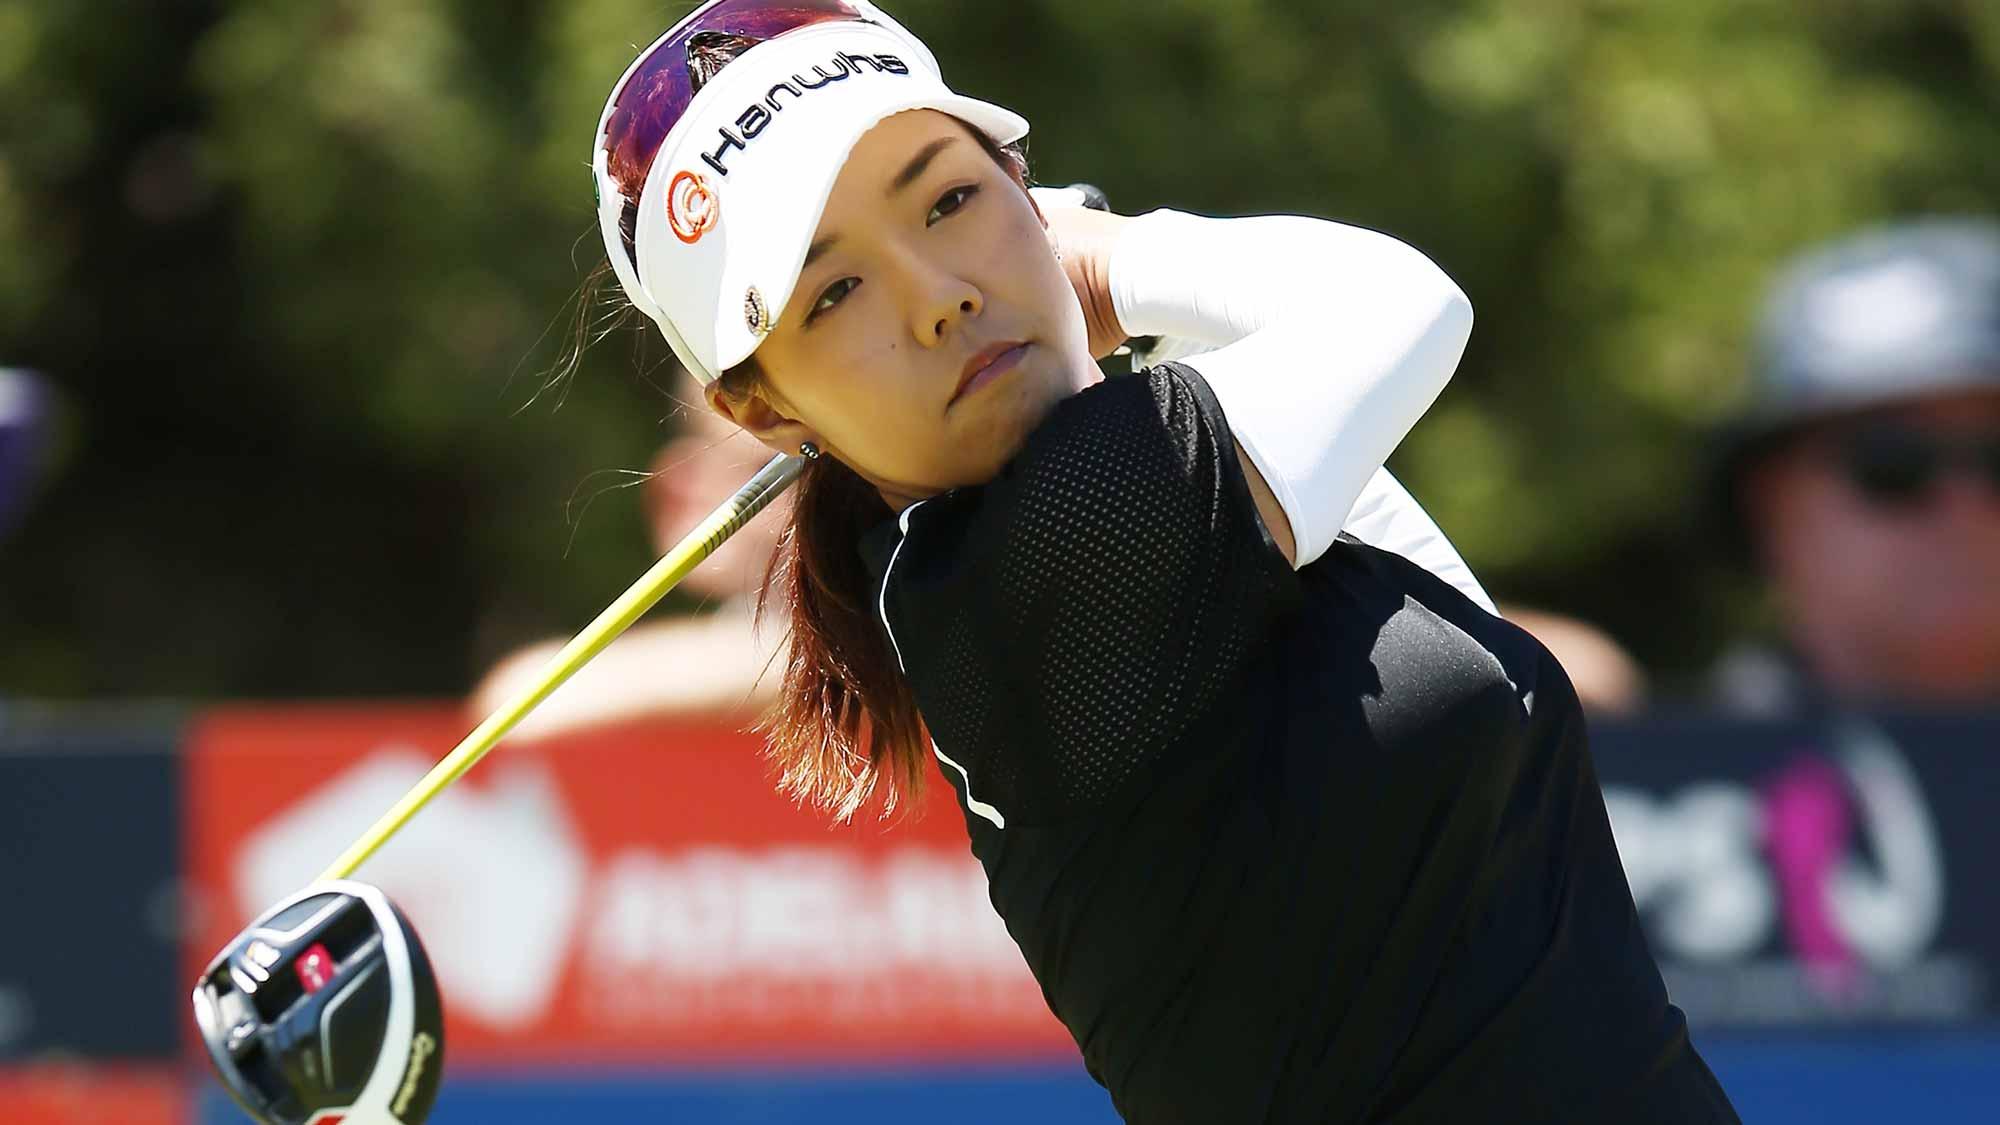 Jenny Shin, Haru Nomura and Danielle Kang Lead Heading Into The Final Round in Australia